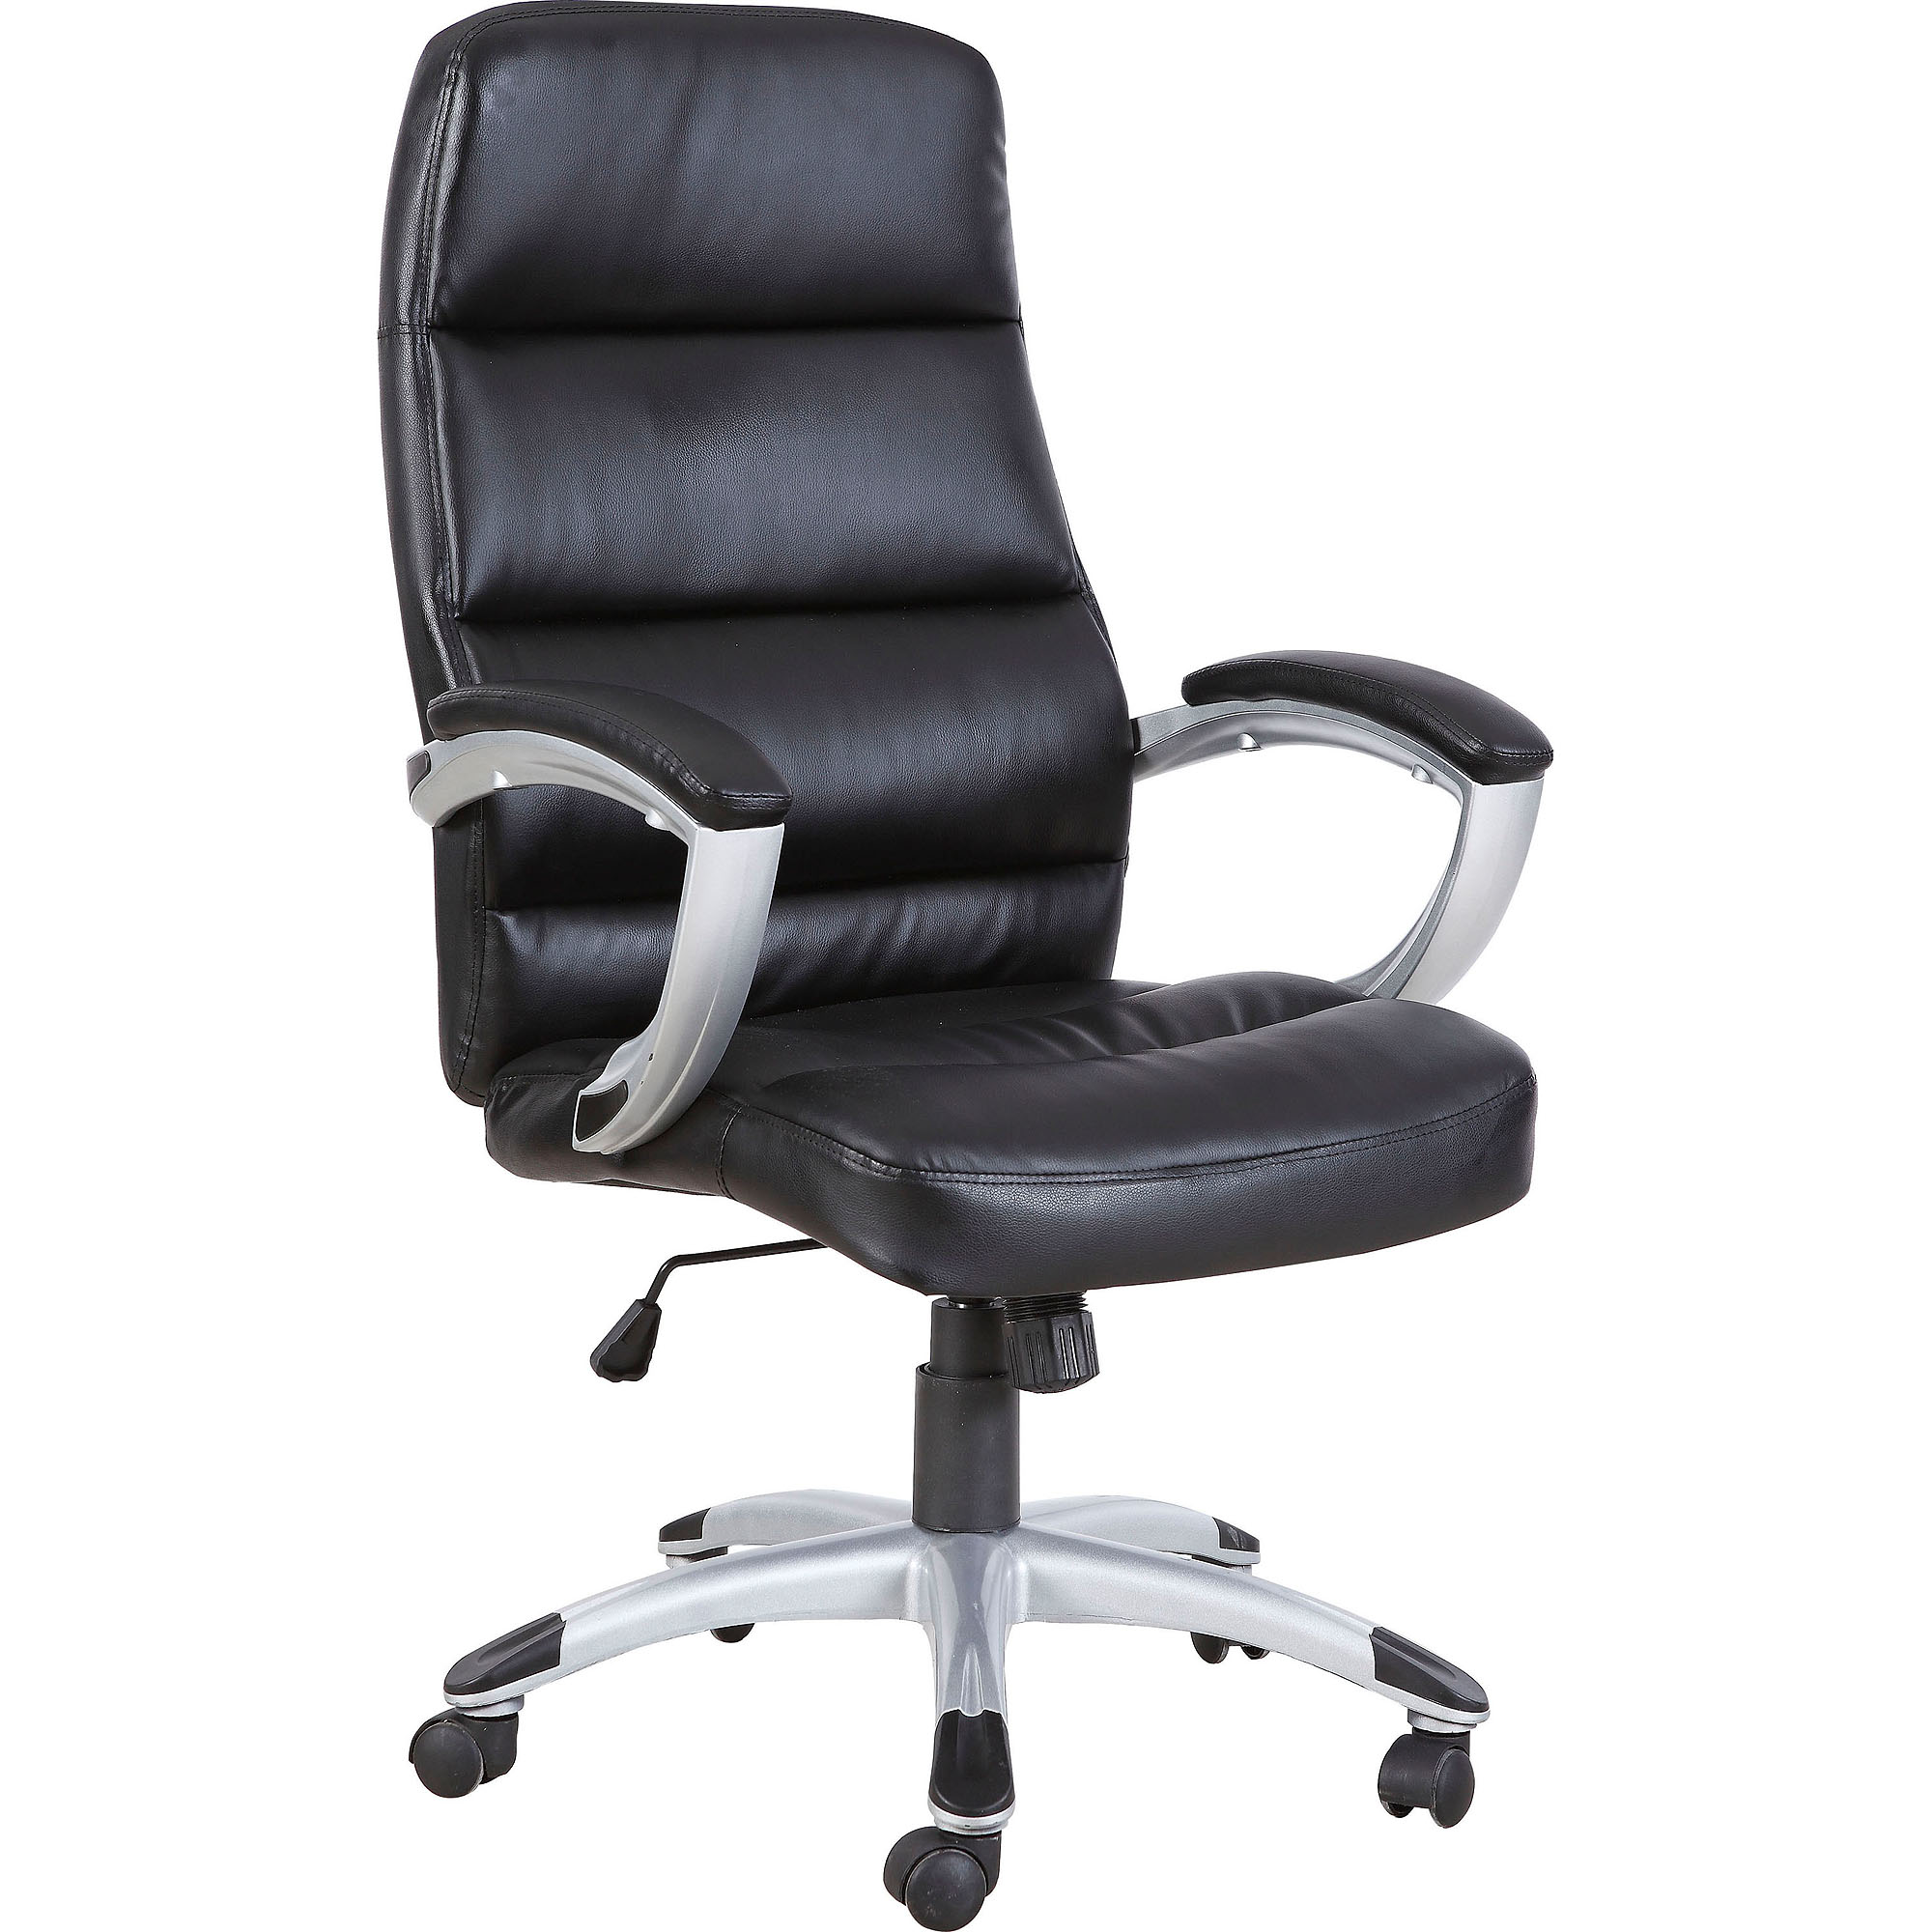 Techni Mobili High Back Executive fice Chair Black